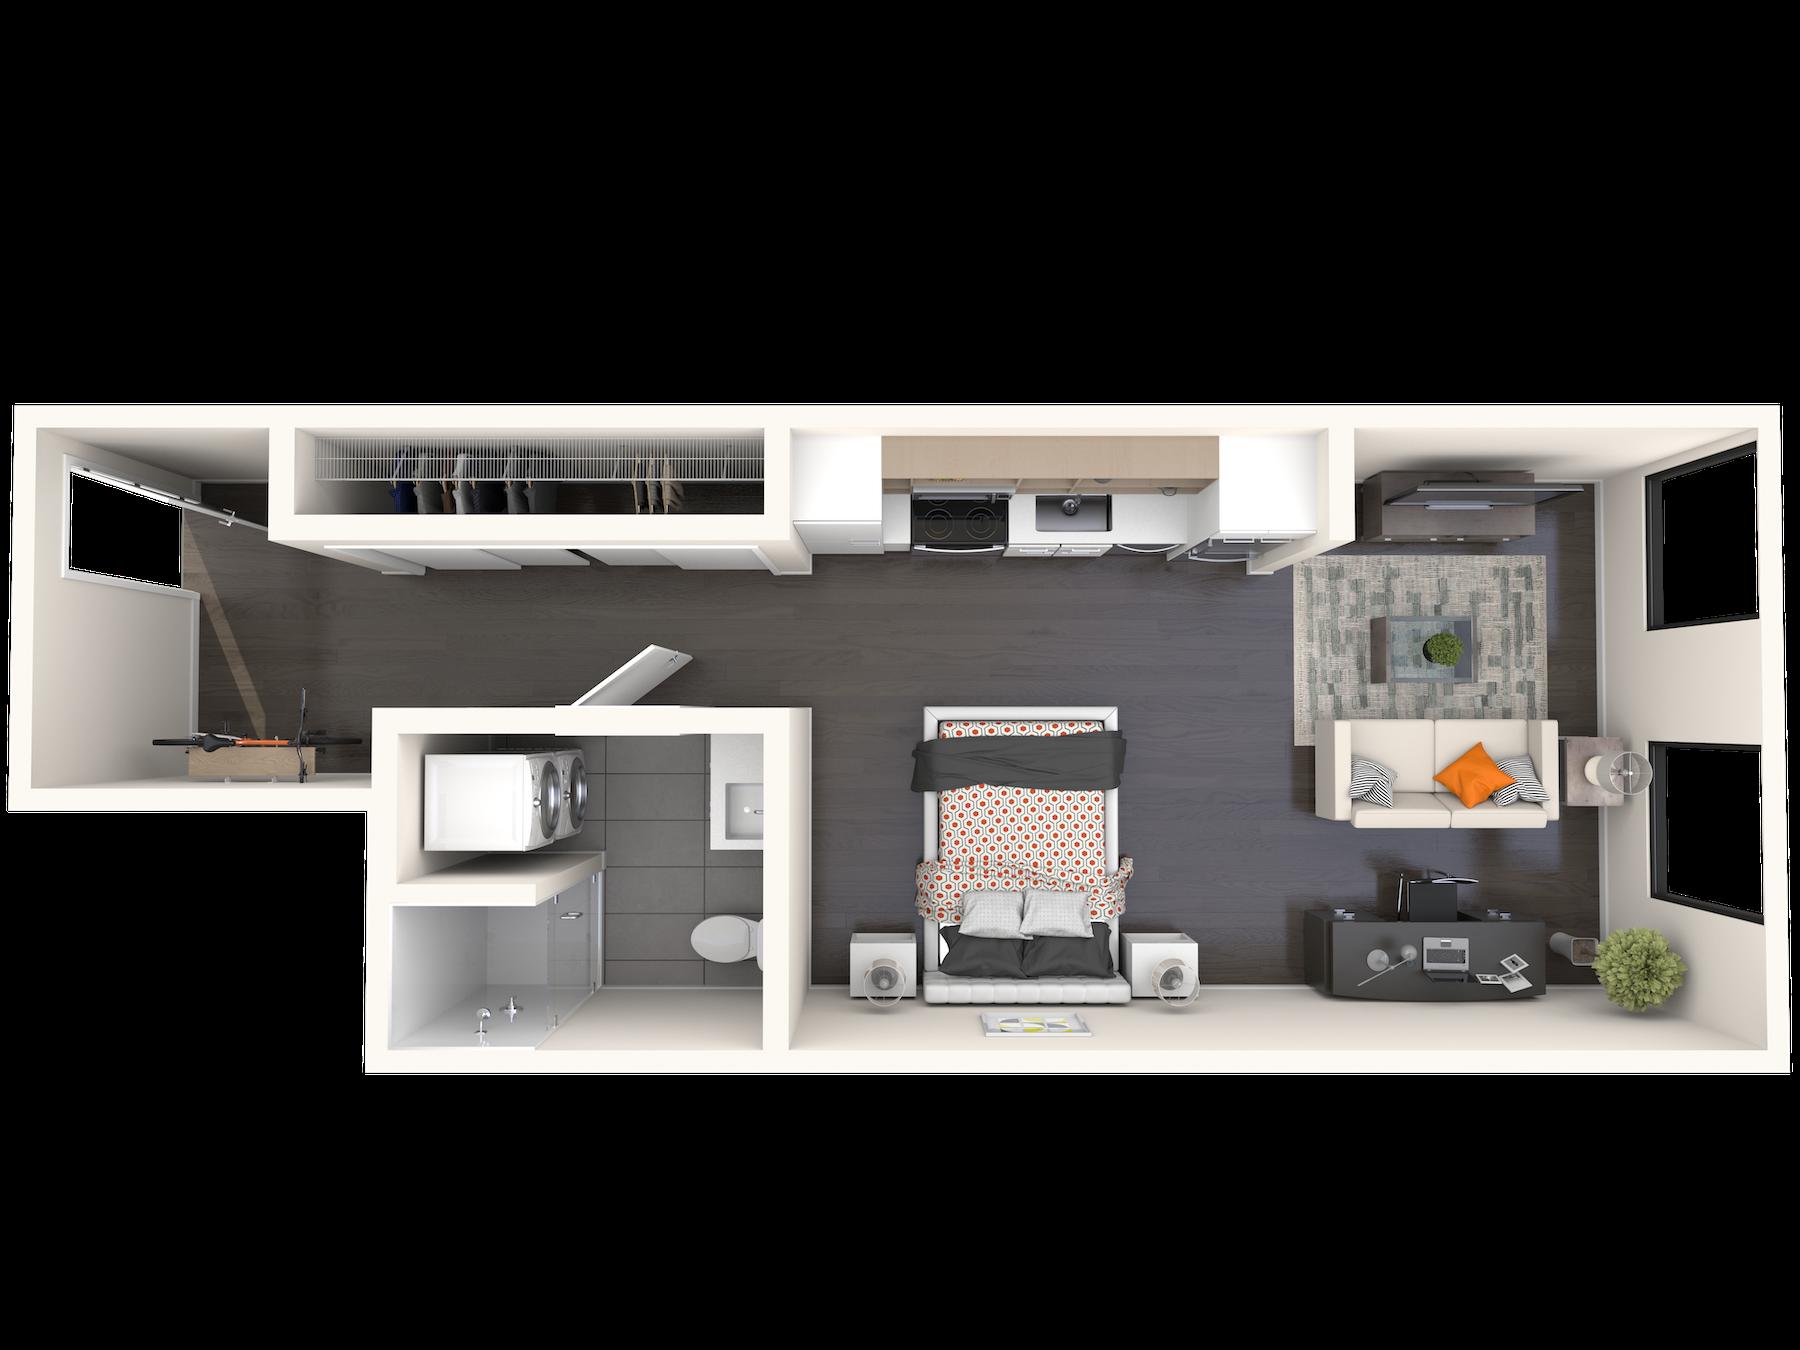 B0.1b Floor Plan